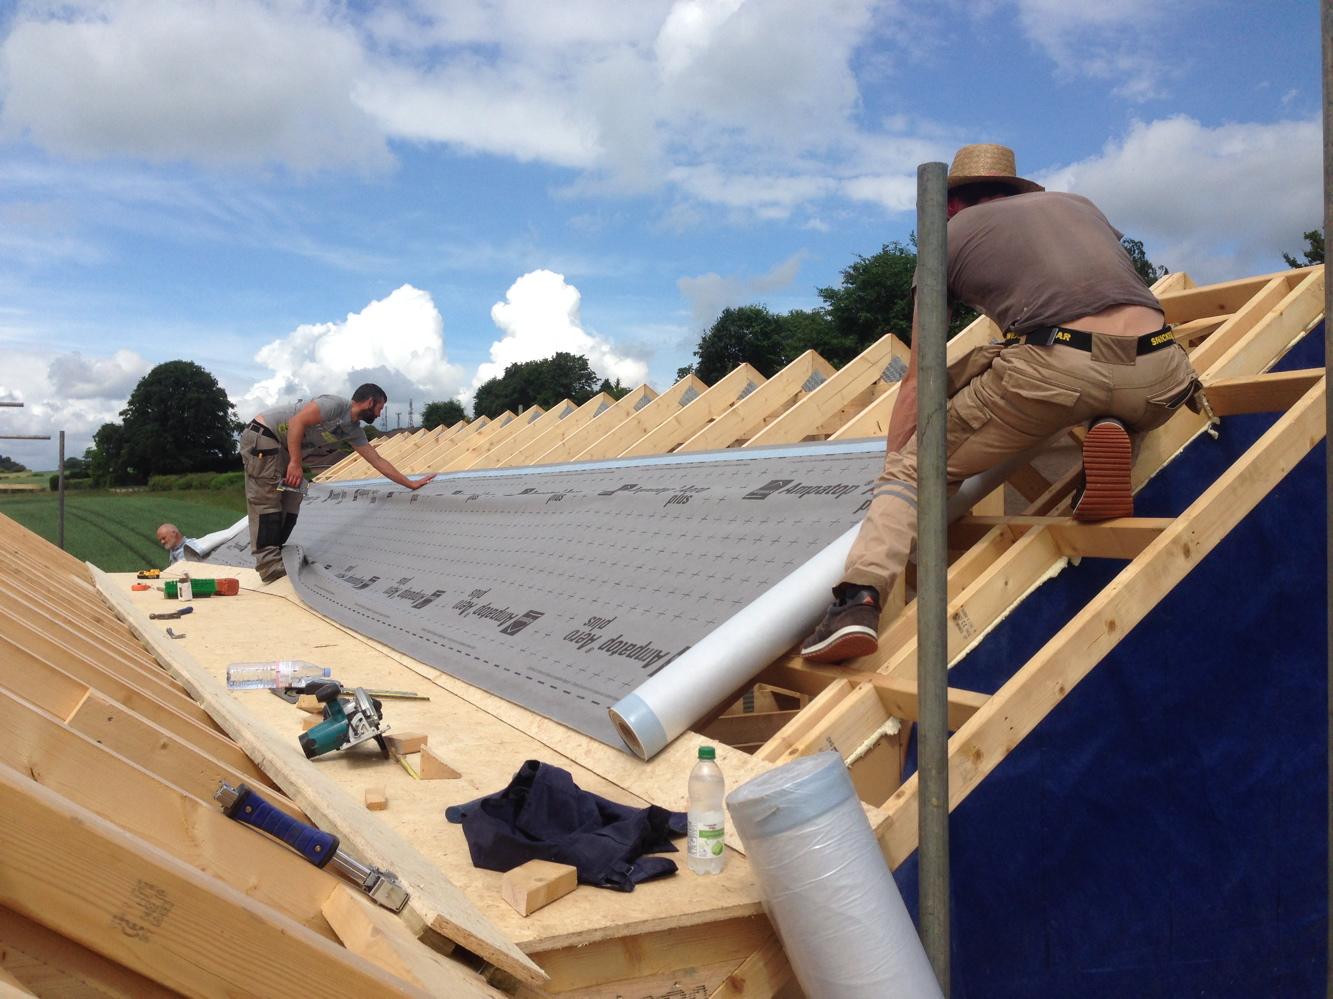 Fixing roofing felt